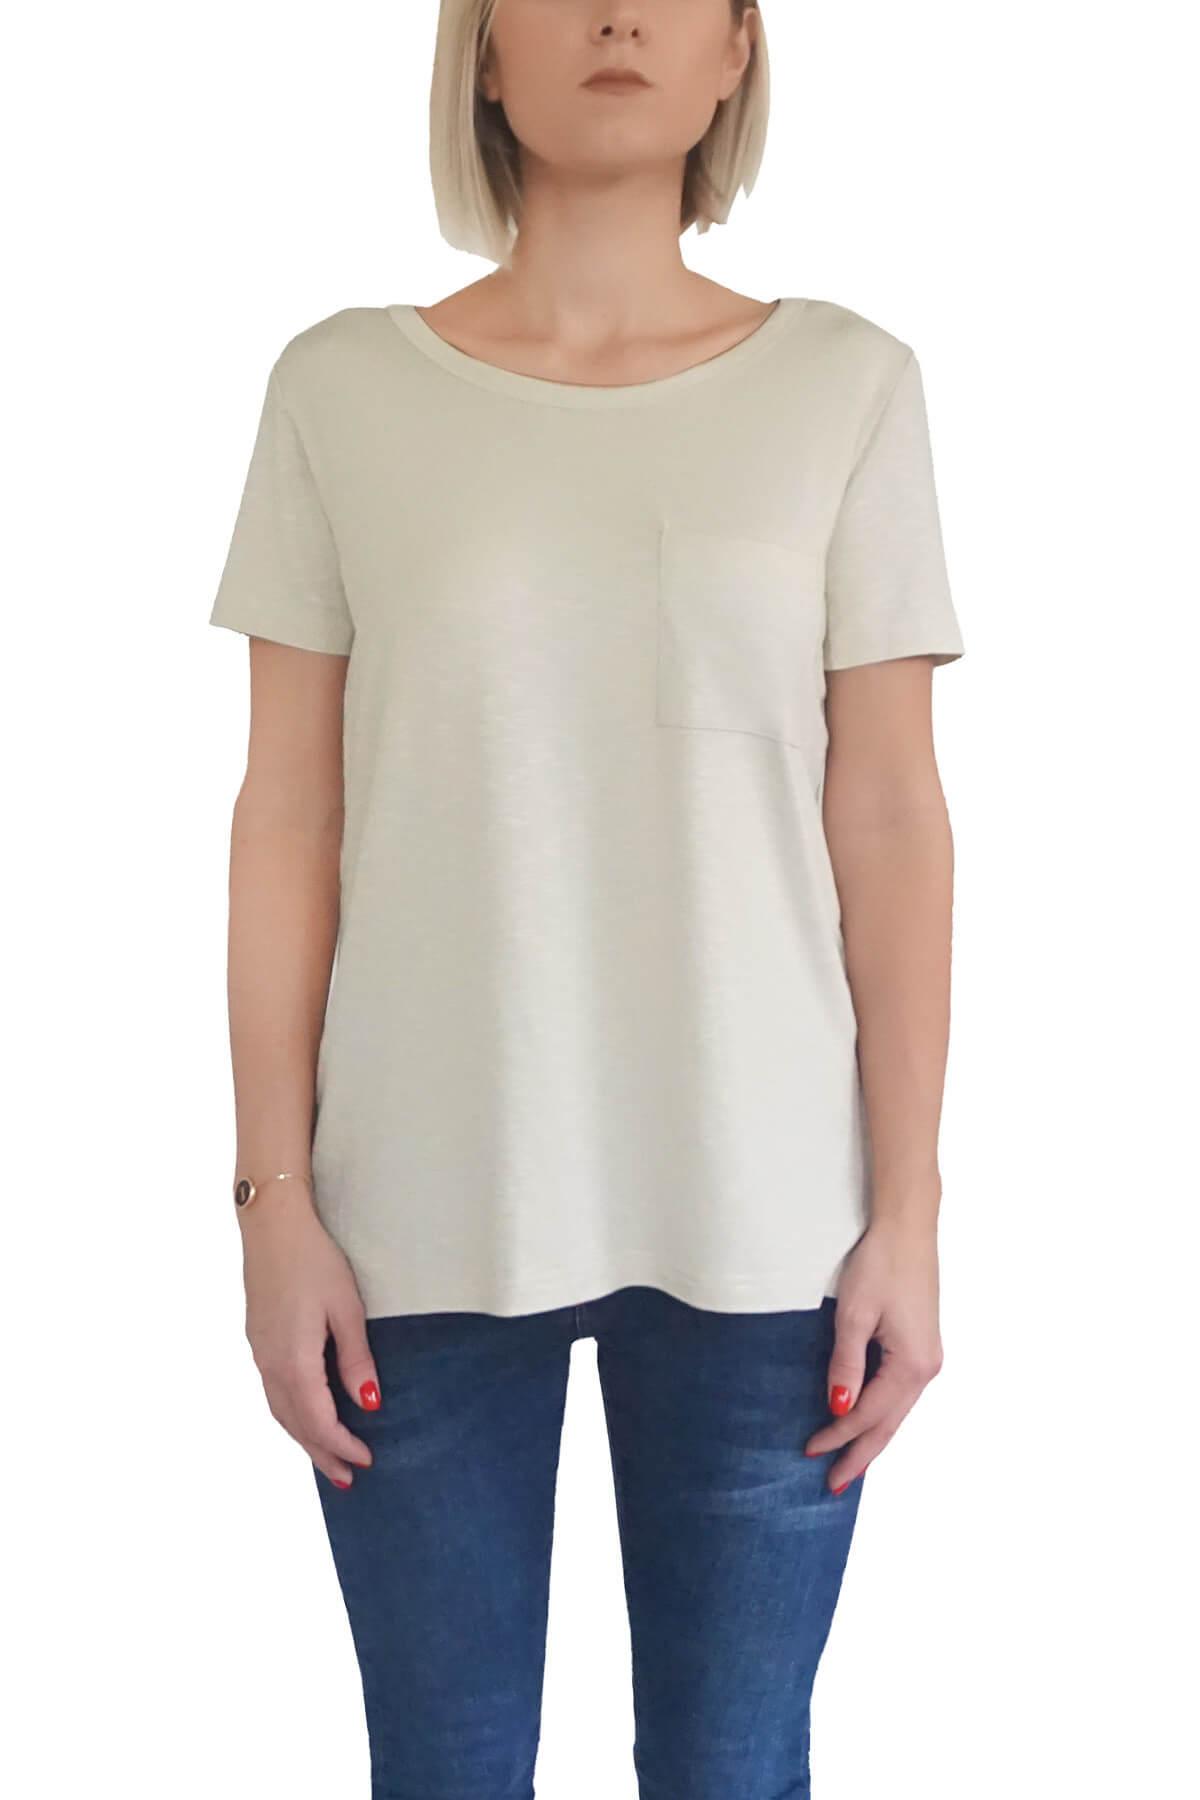 MOF Kadın Taş T-Shirt SYCT-T 1